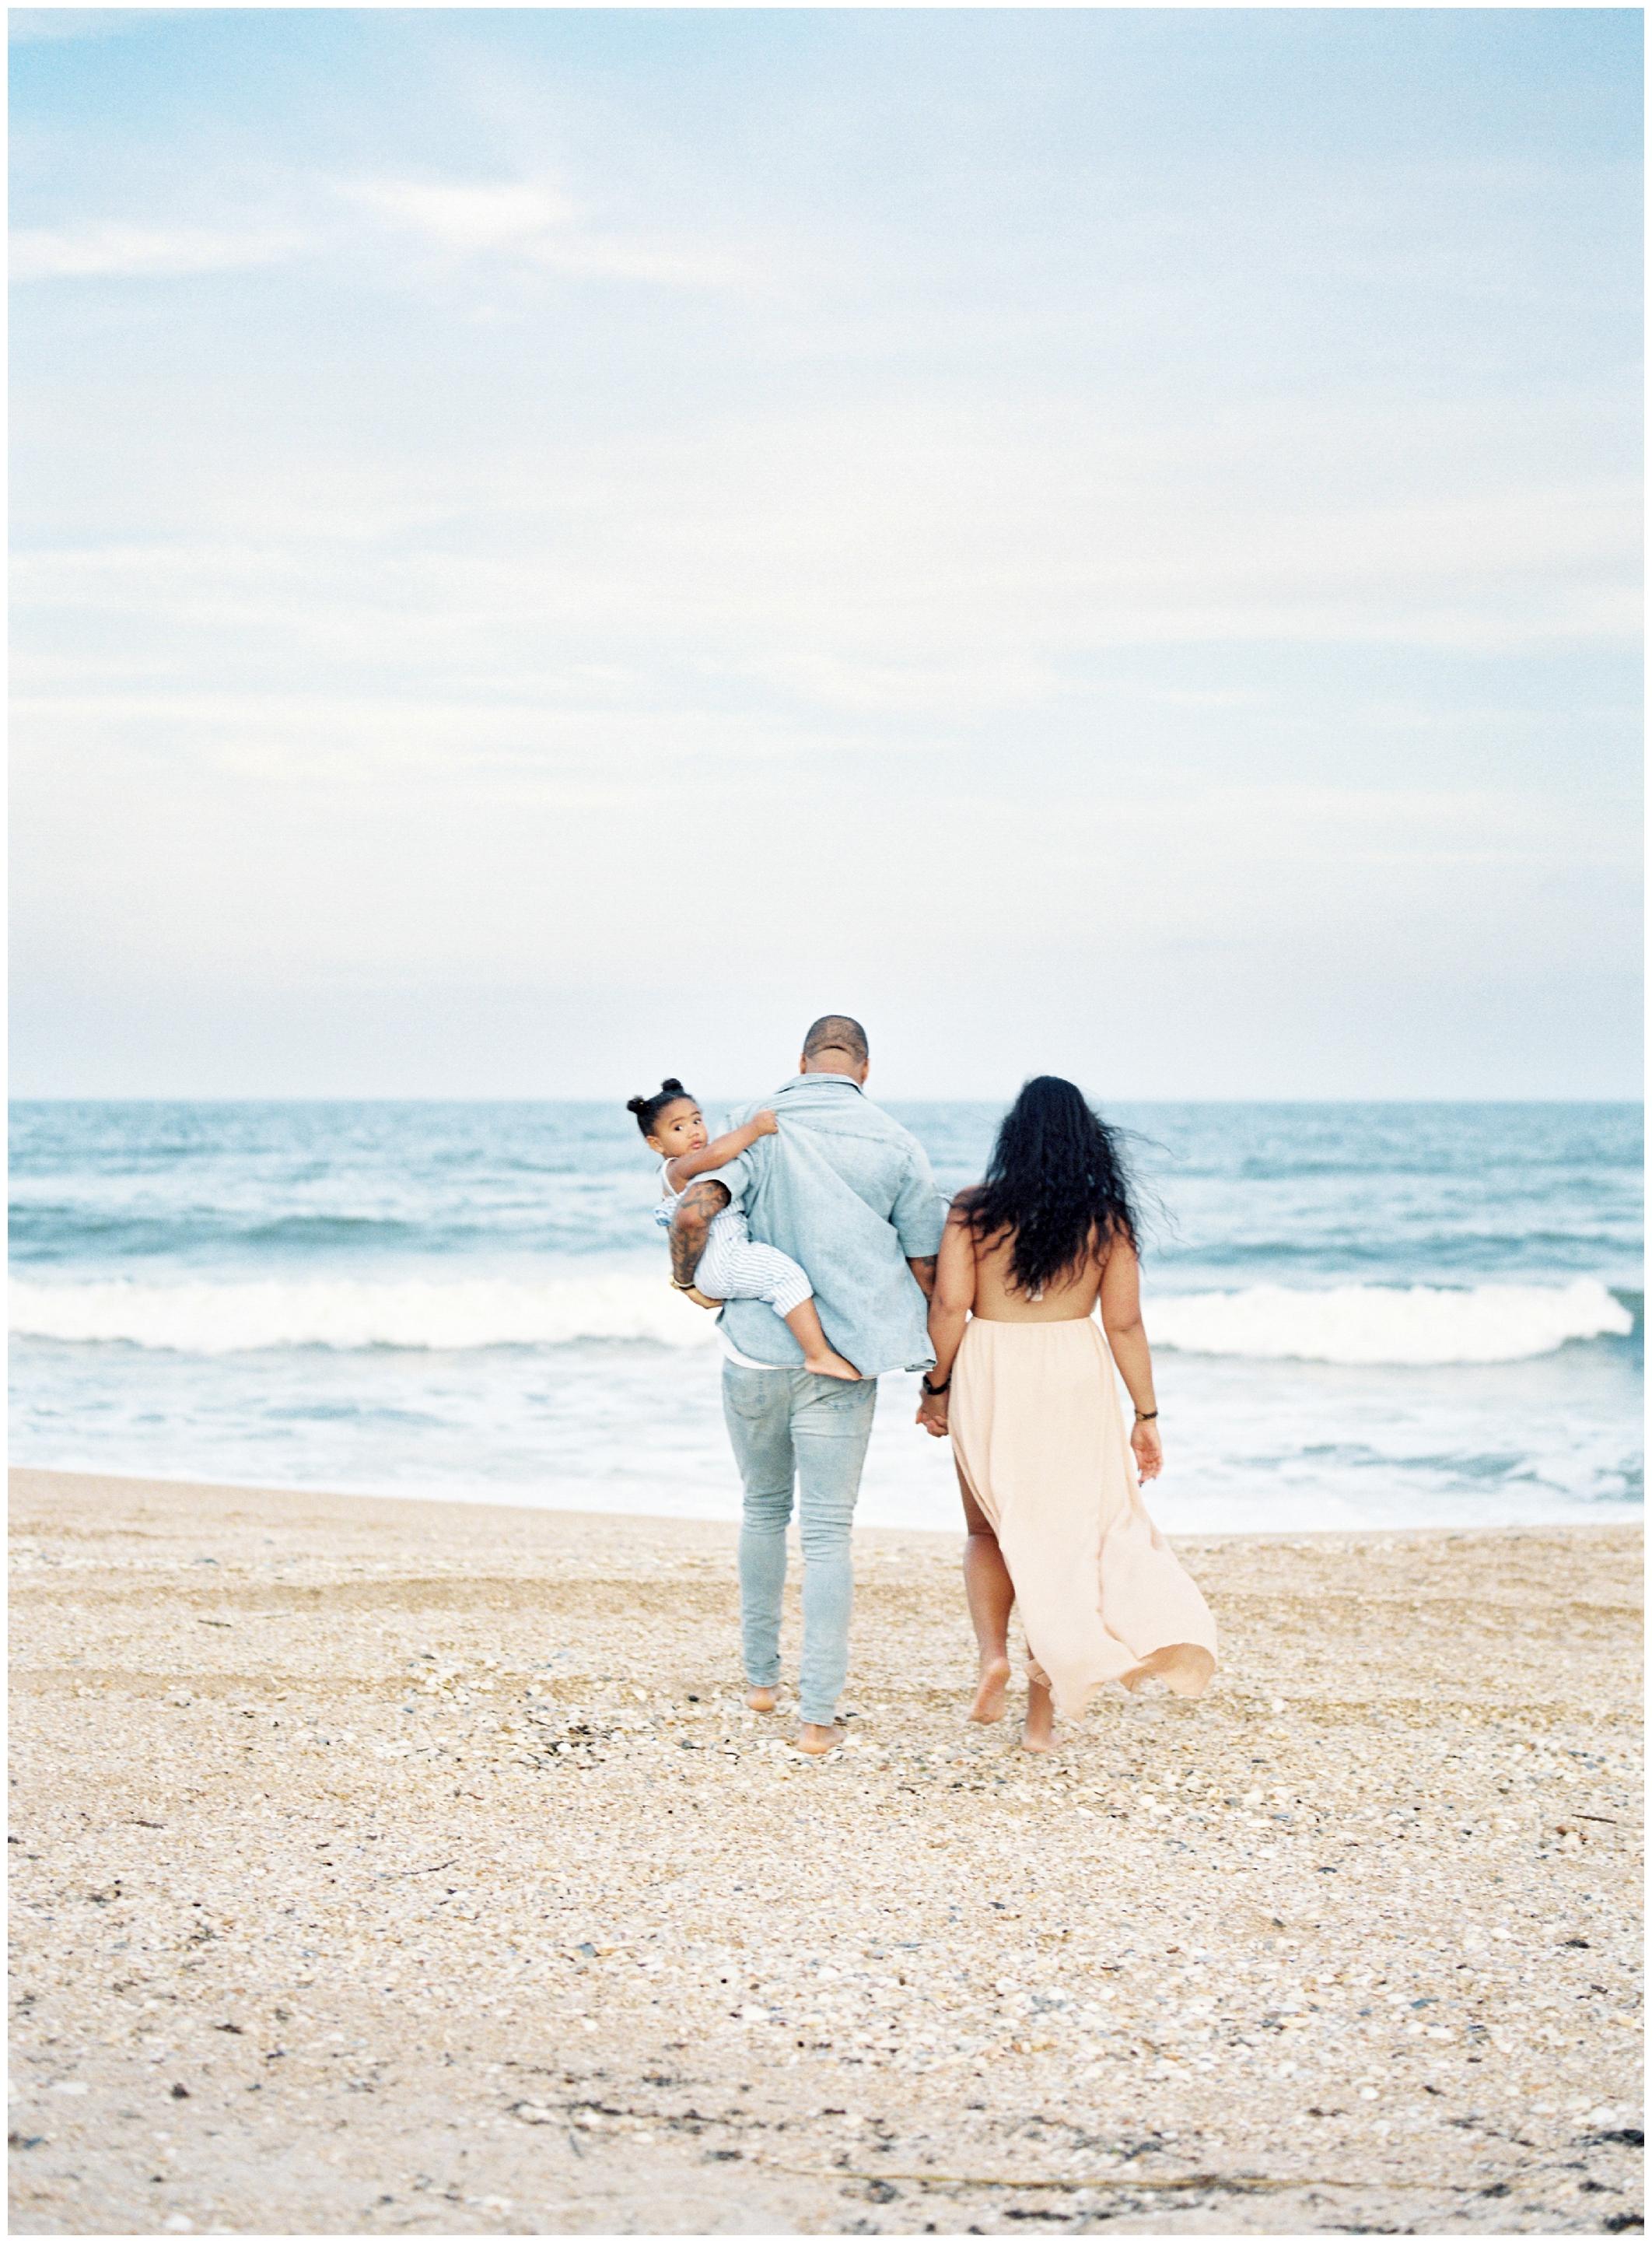 Lisa Silva Photography- Ponte Vedra Beach, St. Augustine and Jacksonville, Florida Fine Art Film Destination Wedding Photography- Family Lifestyle Session at Guana Preserve_0051.jpg